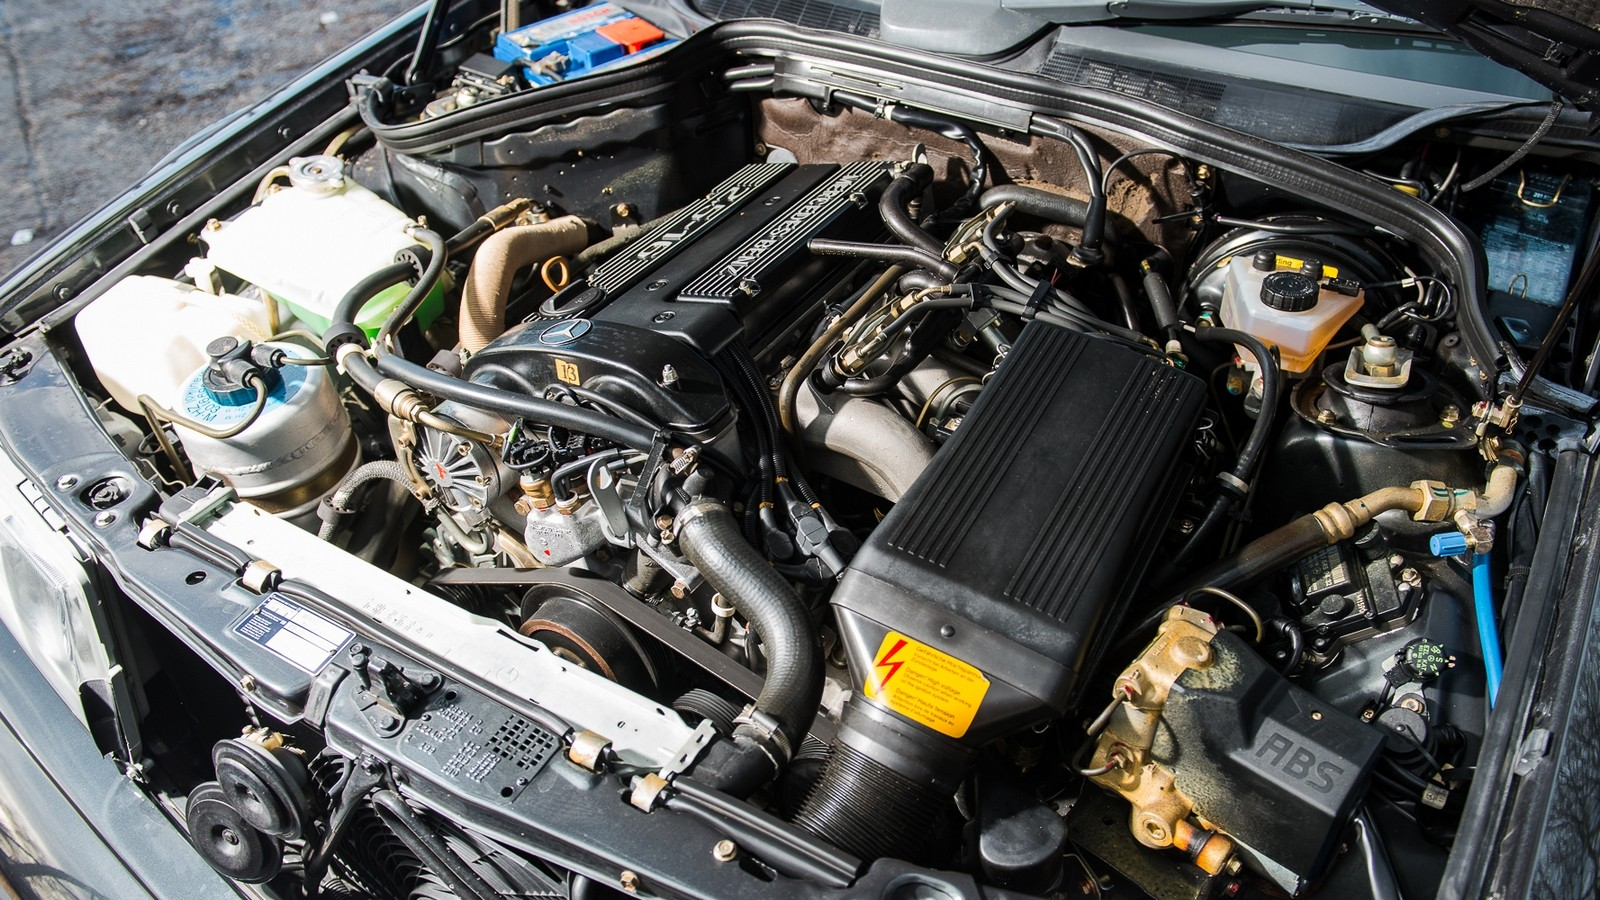 На фото: Под капотом Mercedes-Benz M102.992